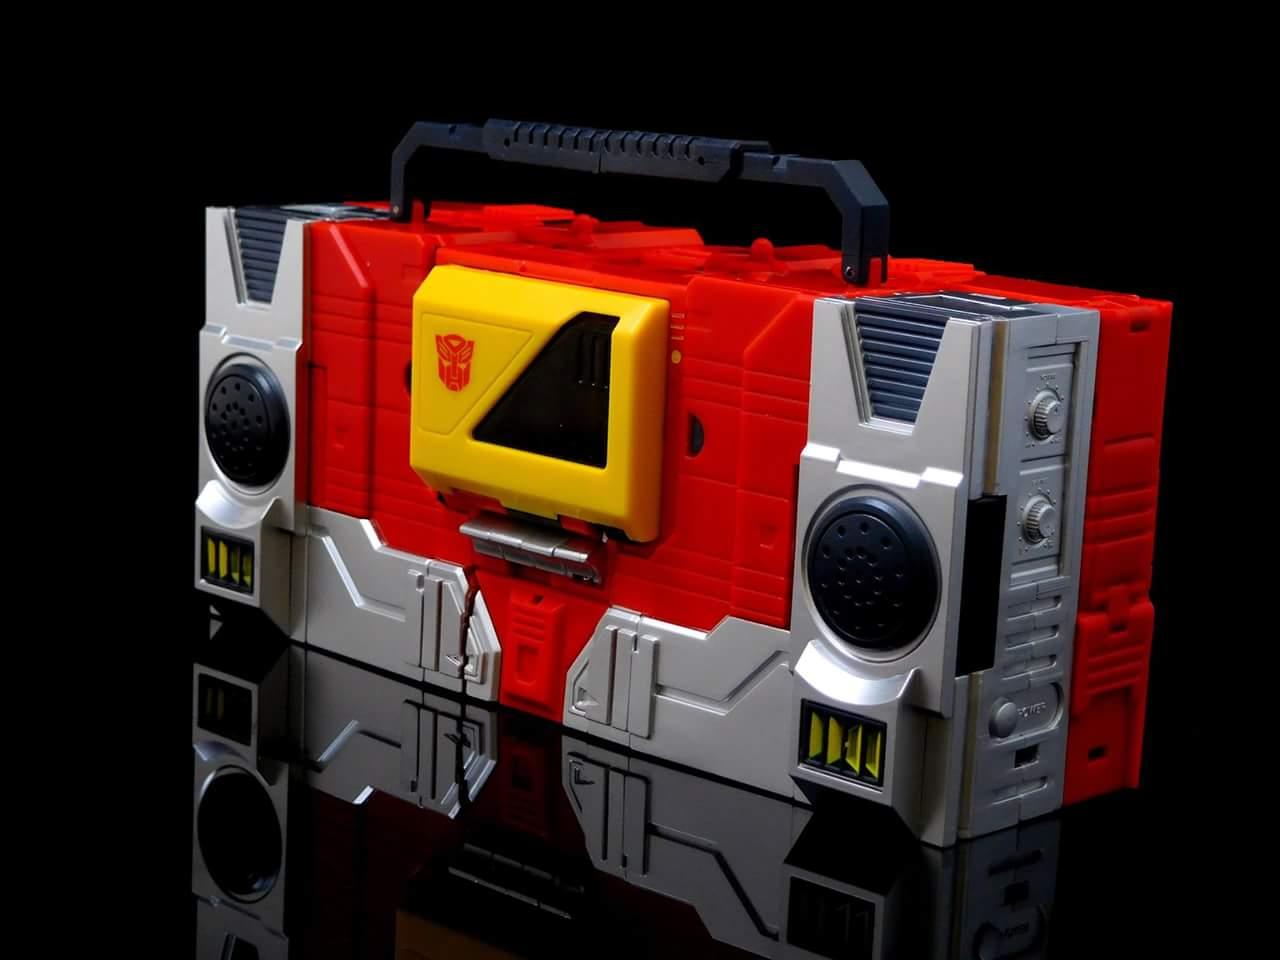 [KFC Toys] Produit Tiers - Jouet Transistor (aka Blaster/Tempo) + DoubleDeck (Twincast) + Fader (aka Eject/Éjecteur) + Rover (aka Autoscout) - Page 2 1gKDgVn4